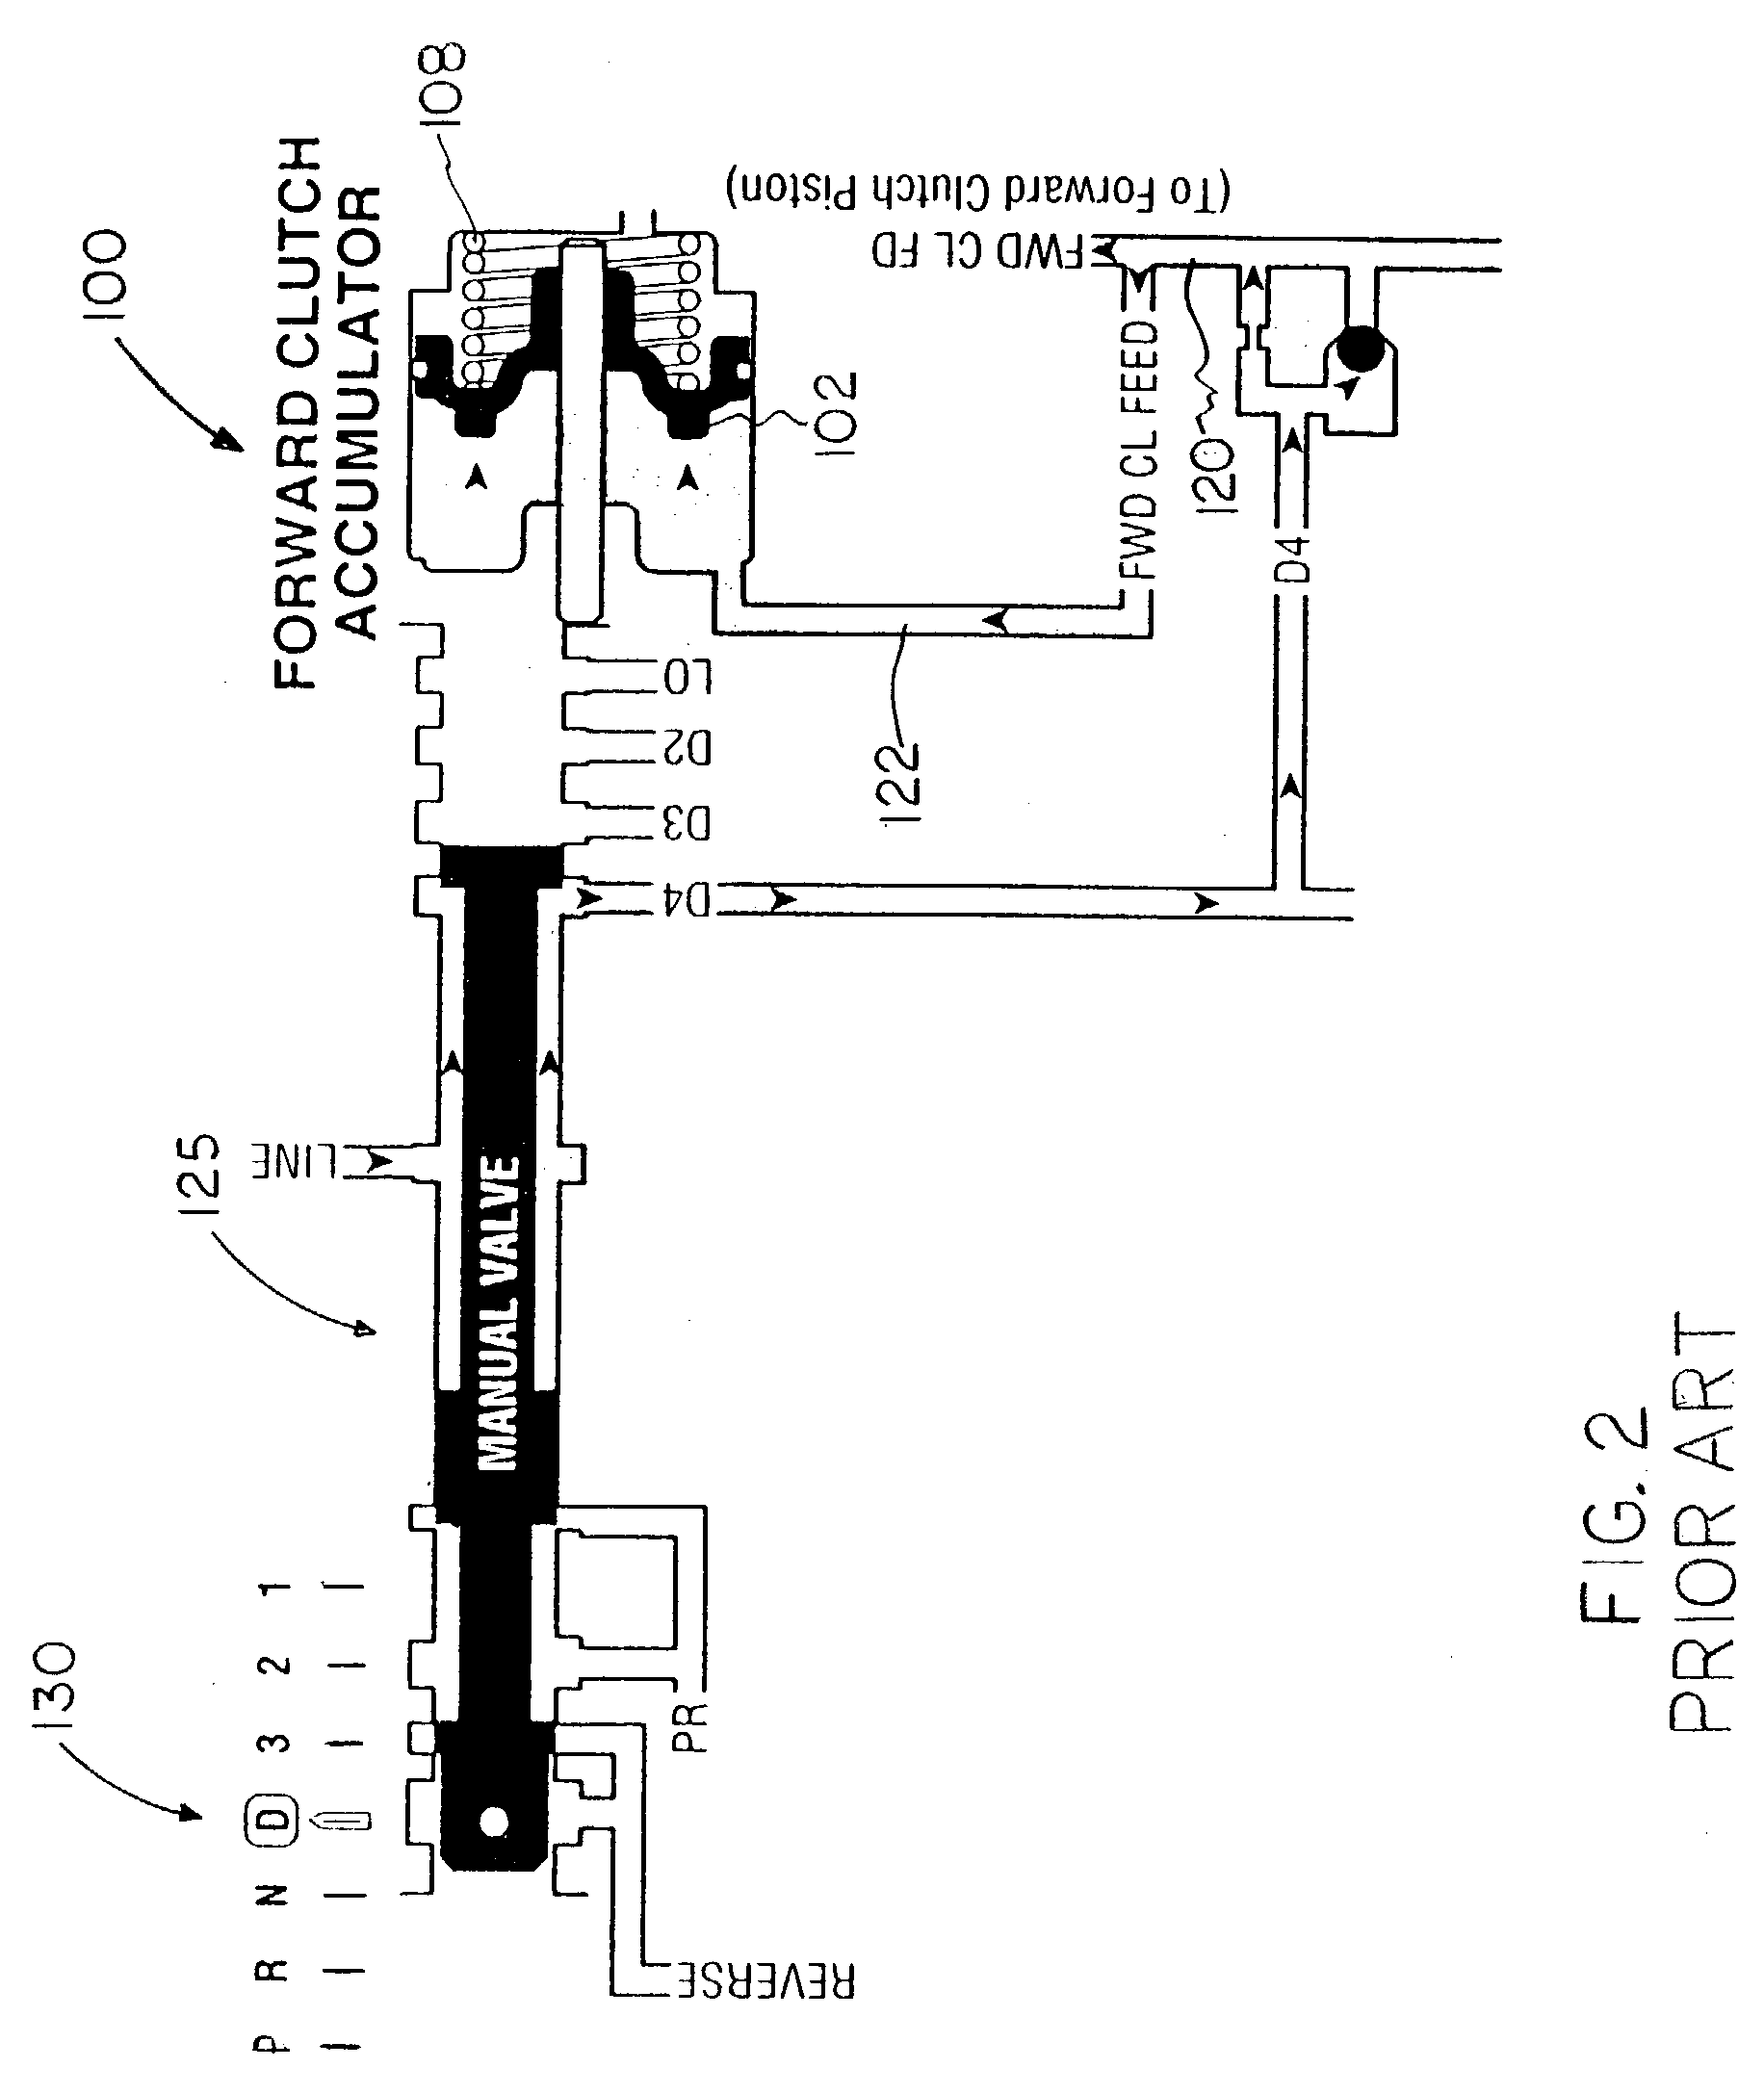 hight resolution of patent us20050034953 pinless accumulator piston google patents patent drawing